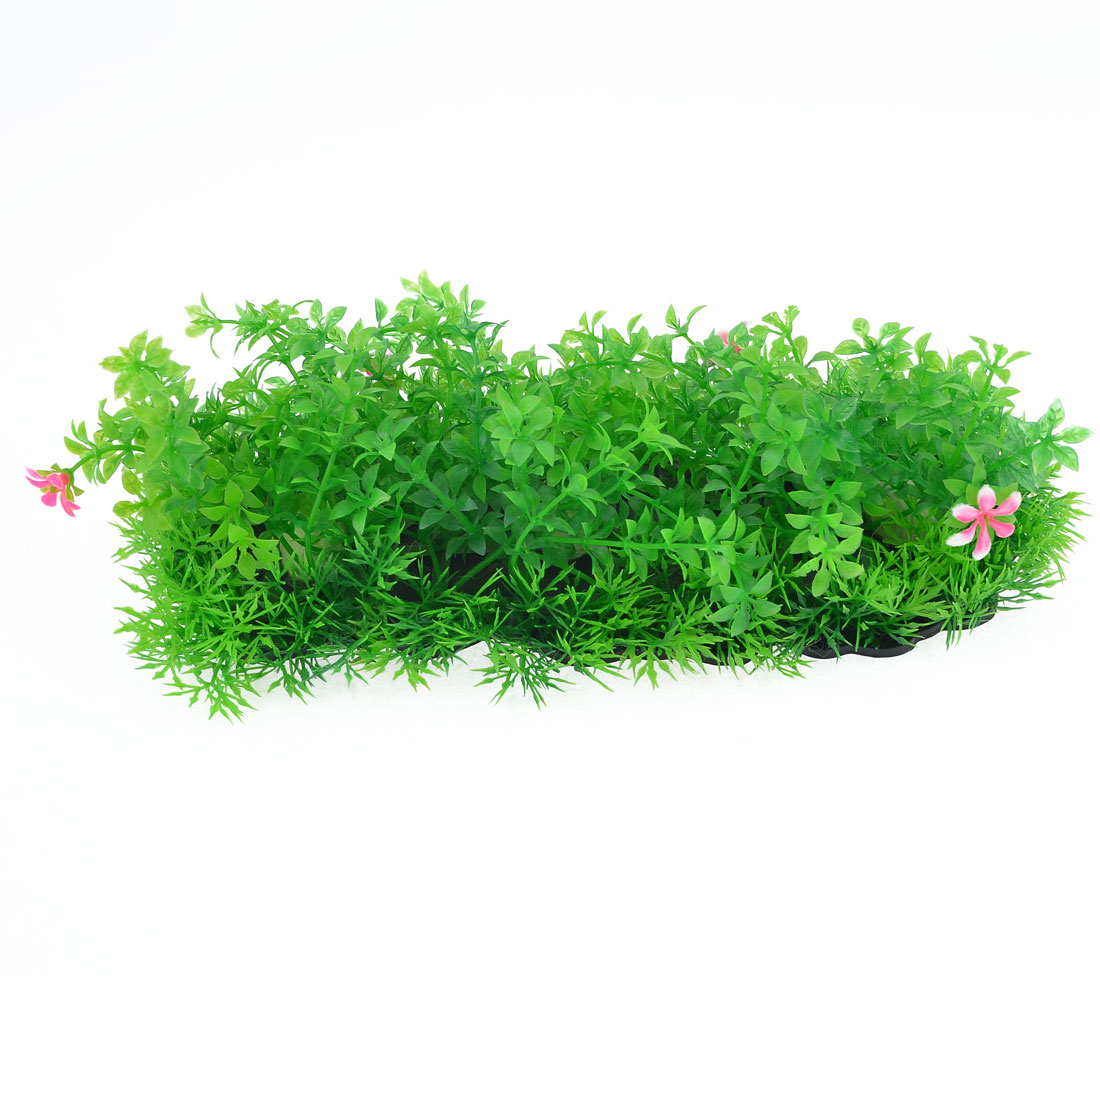 Oval Shaped Green Plastic Aquarium Ornament Grass Plant w Black Plastic Base